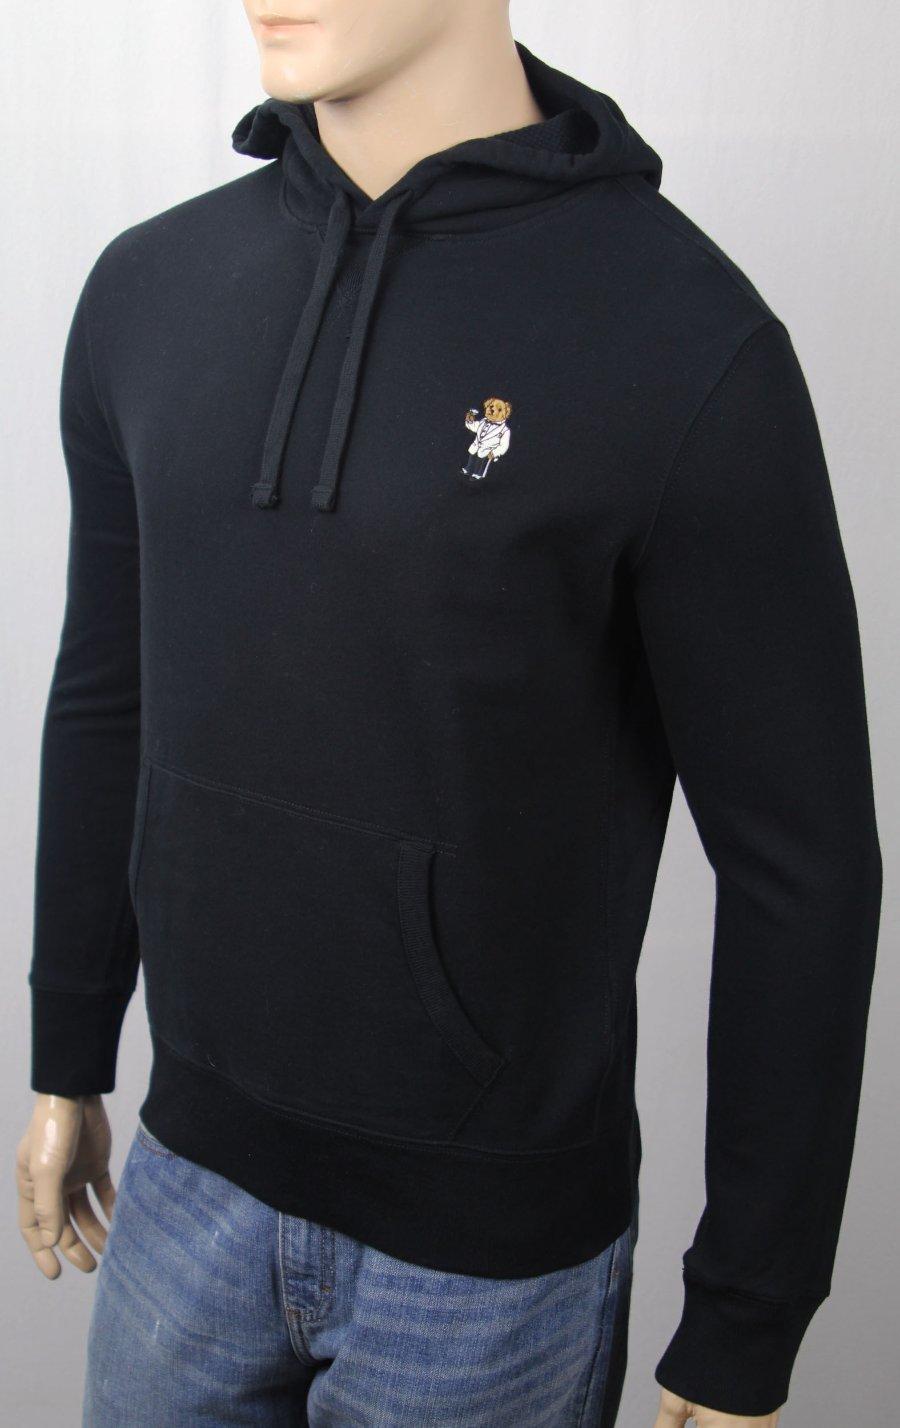 Details about Polo Ralph Lauren Black Tuxedo Martini Teddy Bear Hoodie Pullover Sweatshirt NWT